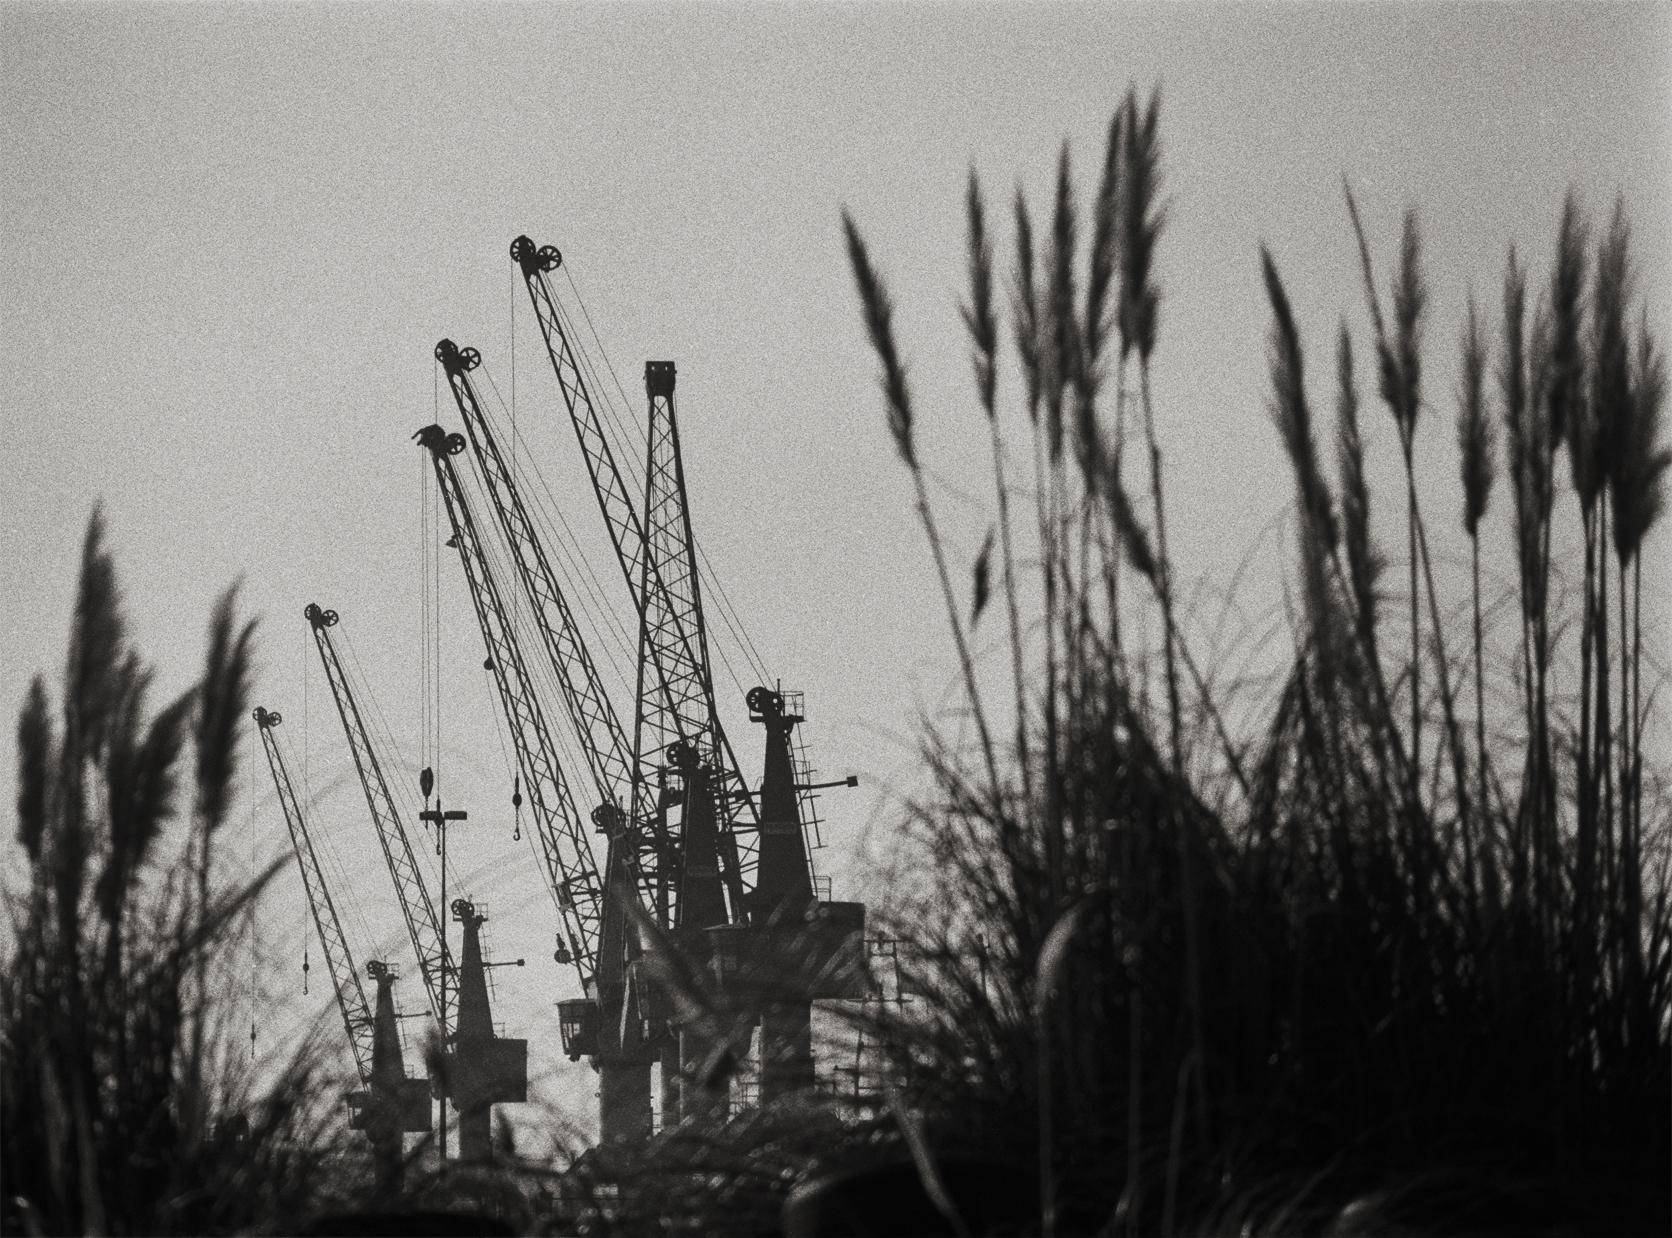 Harbor, Black & White Photography, Gelatin Silver Print, Signed, Portugal 2000